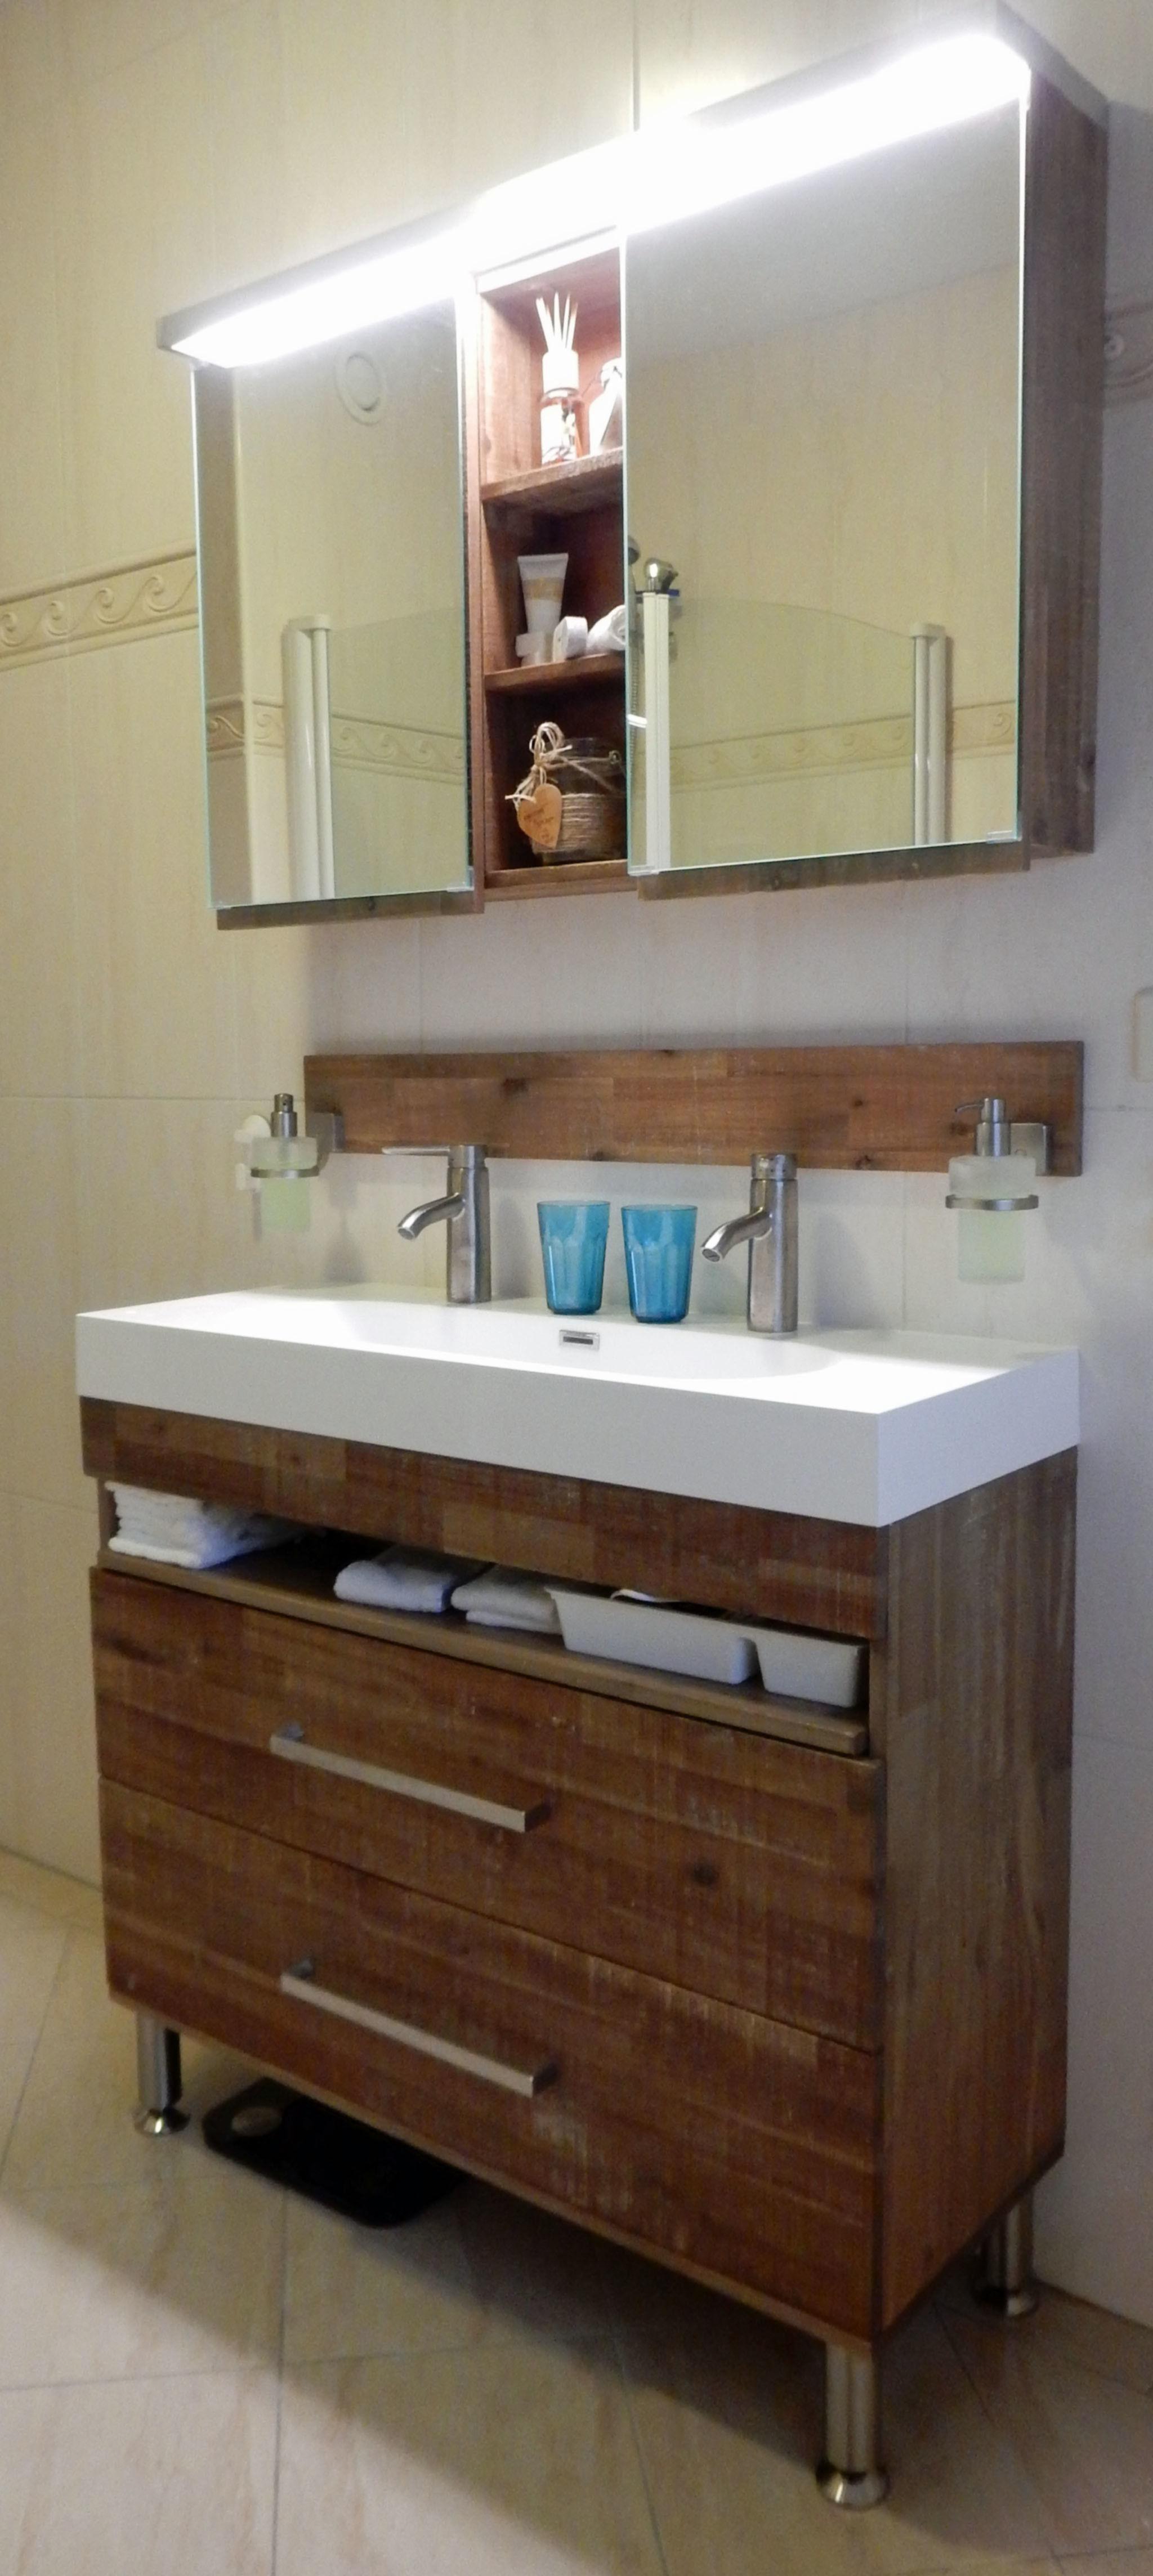 Fabulous badkamermeubel op poten rv97 belbin info for Badkamermeubel ontwerpen